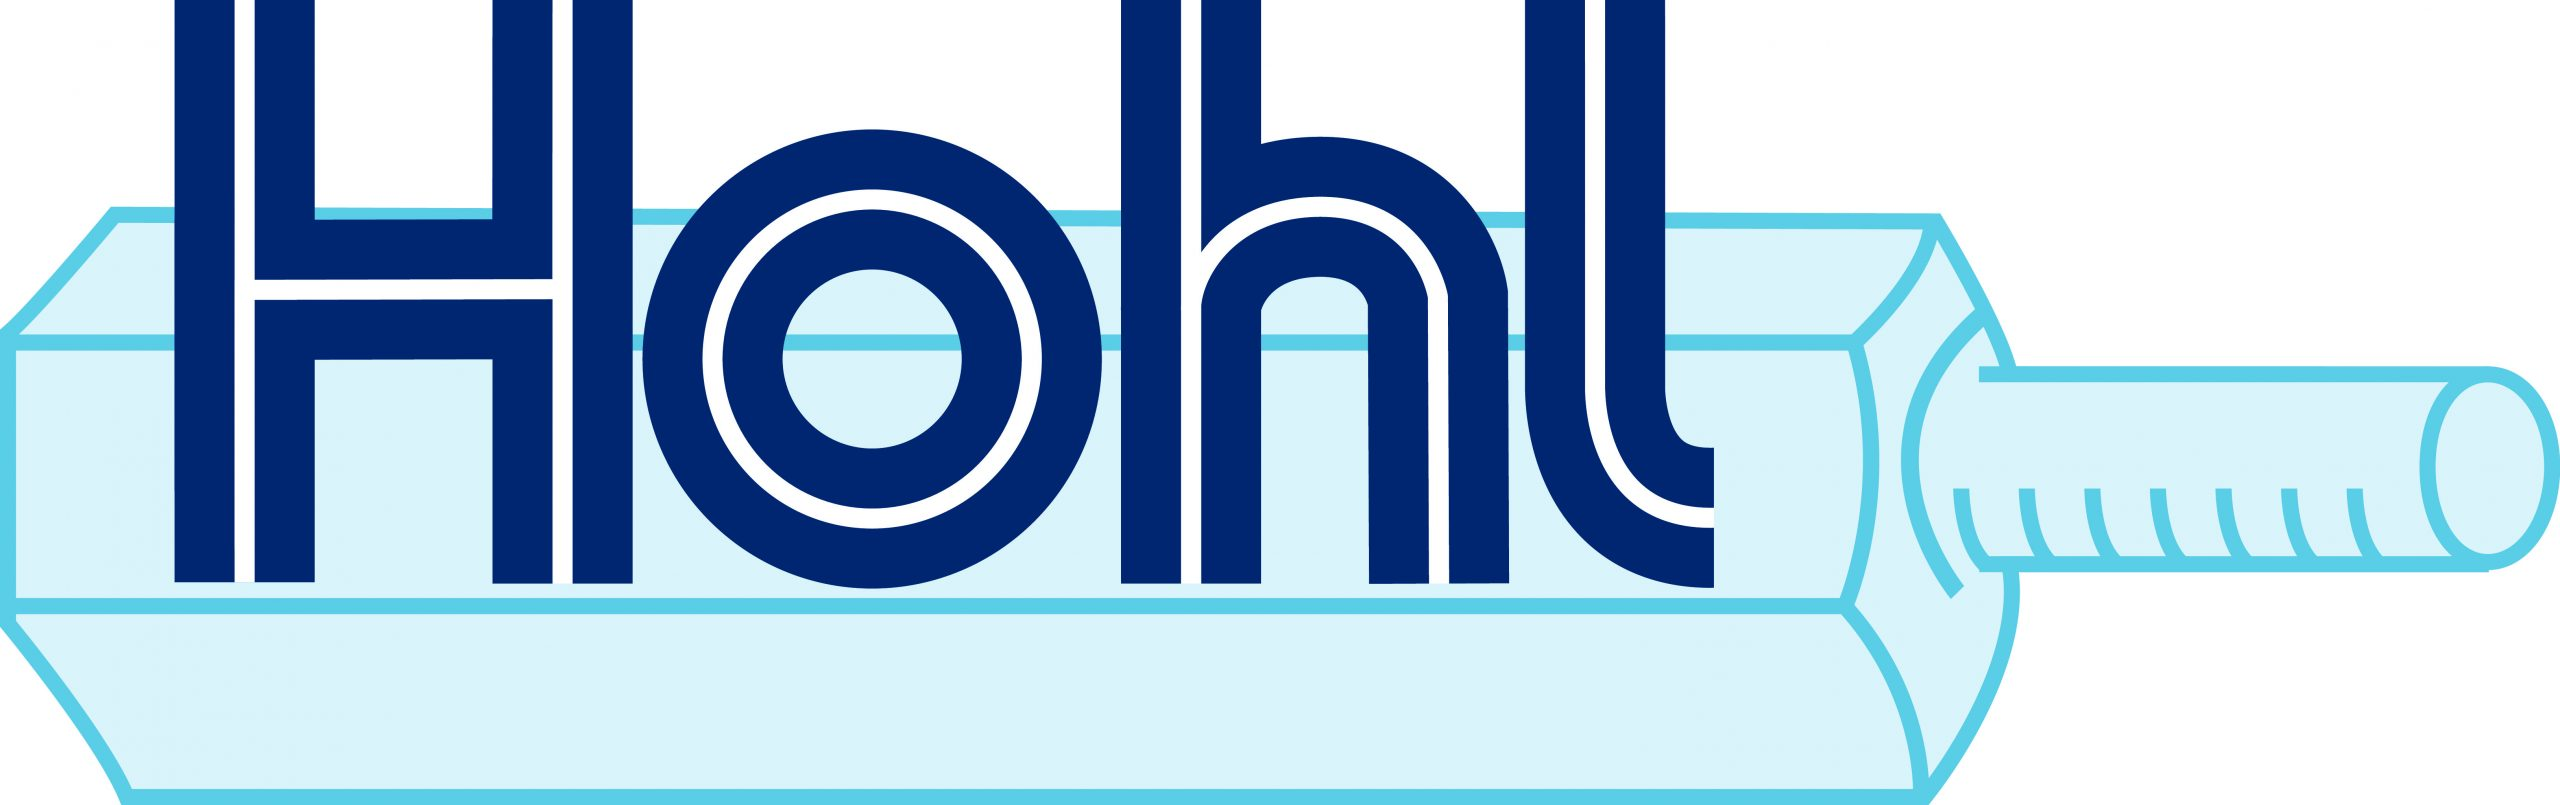 Hans Hohl GmbH